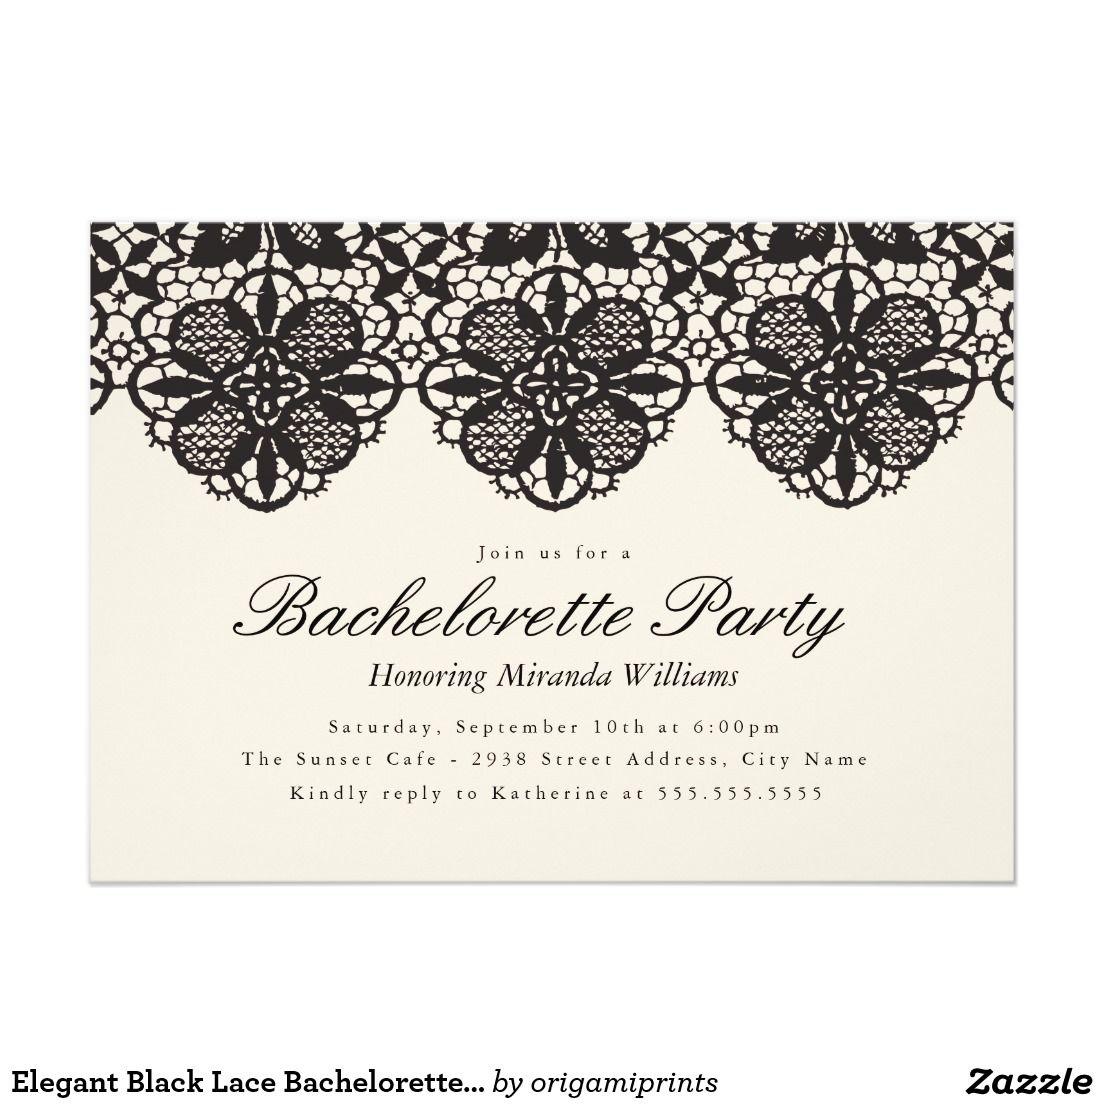 Elegant Black Lace Bachelorette Party Invitation | Hen nights, Party ...